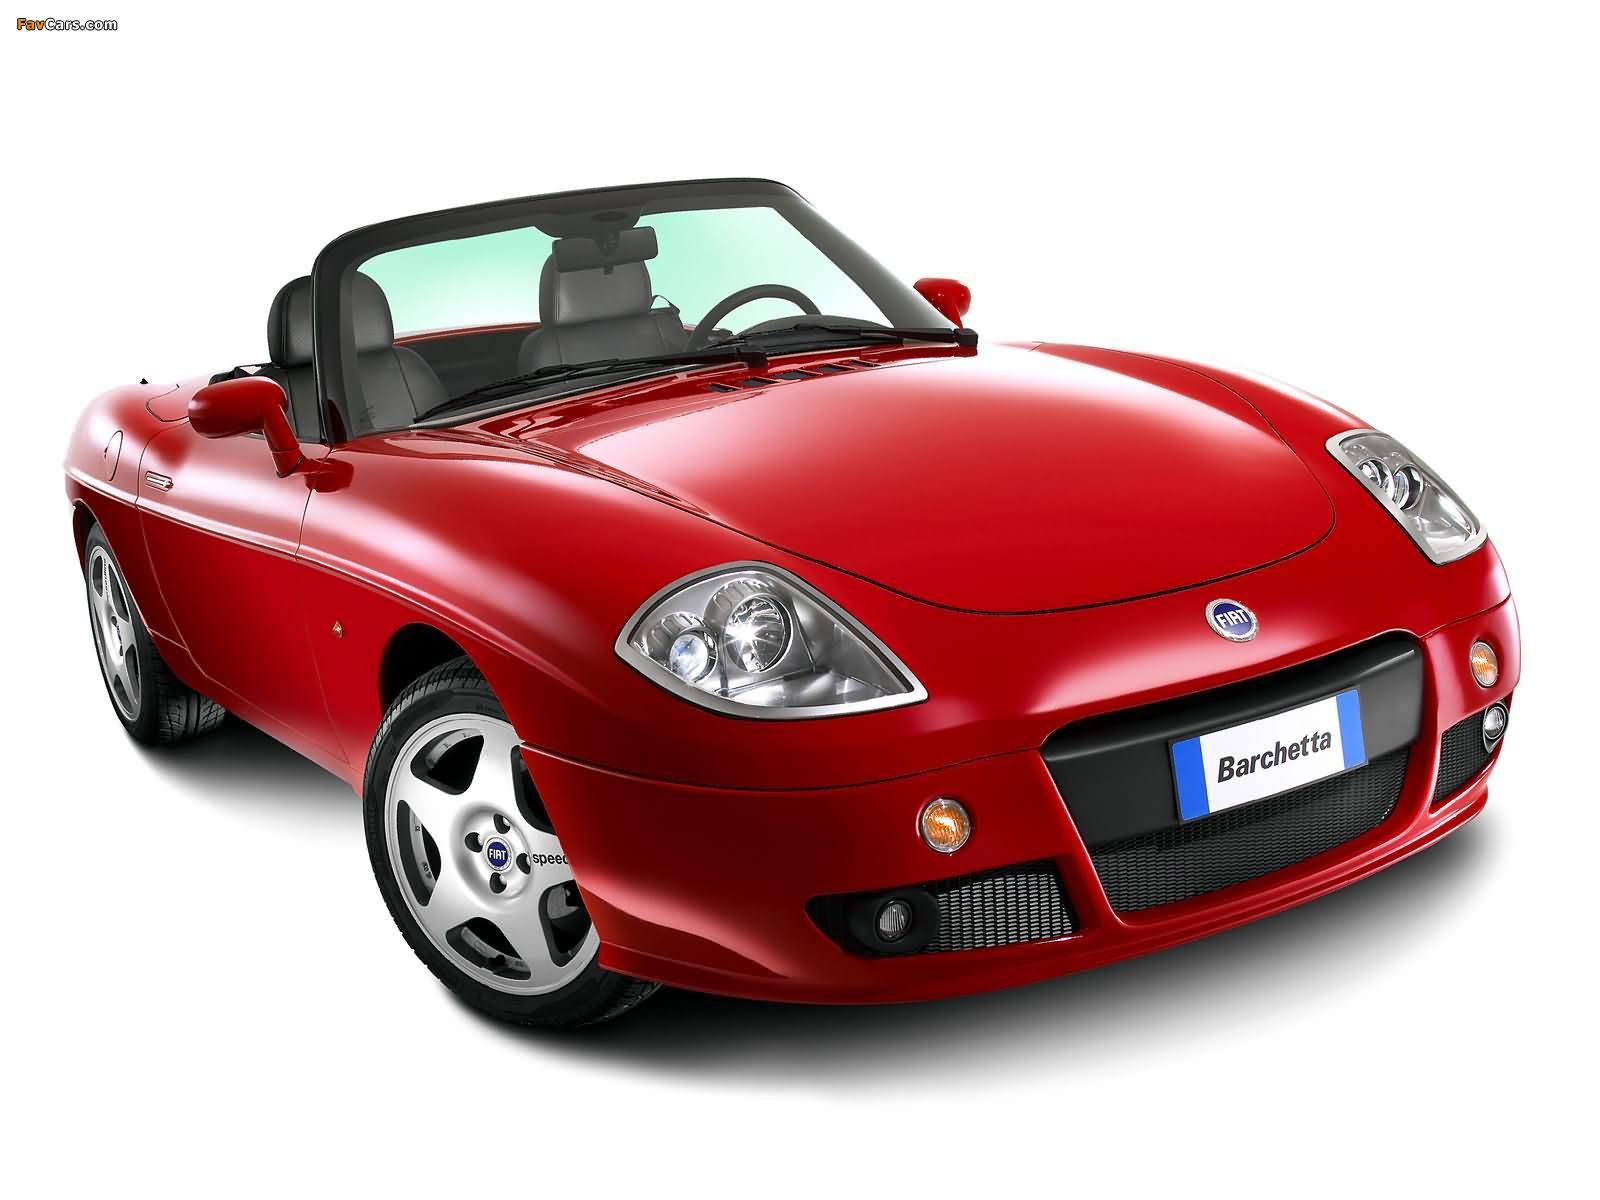 Images Of Fiat Barchetta 2004 05 Voiture Voiture Neuve Ferrari